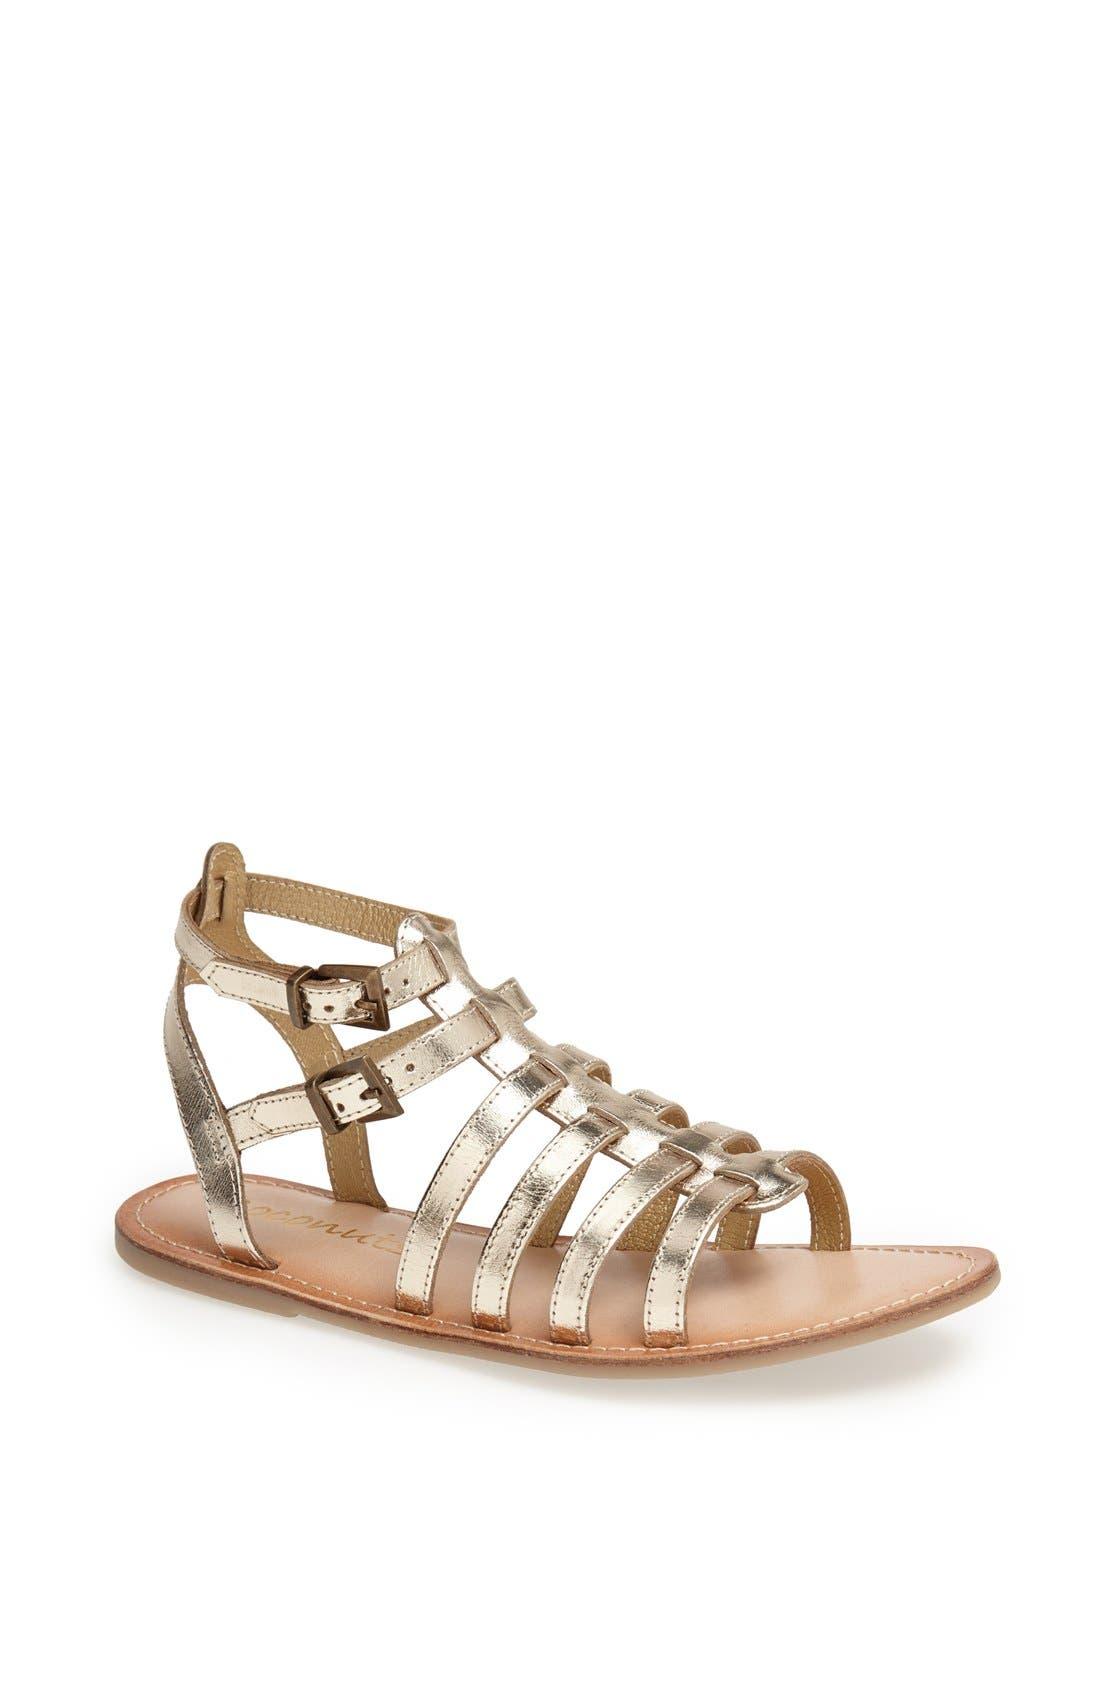 Alternate Image 1 Selected - Matisse 'Storybook' Flat Leather Sandal